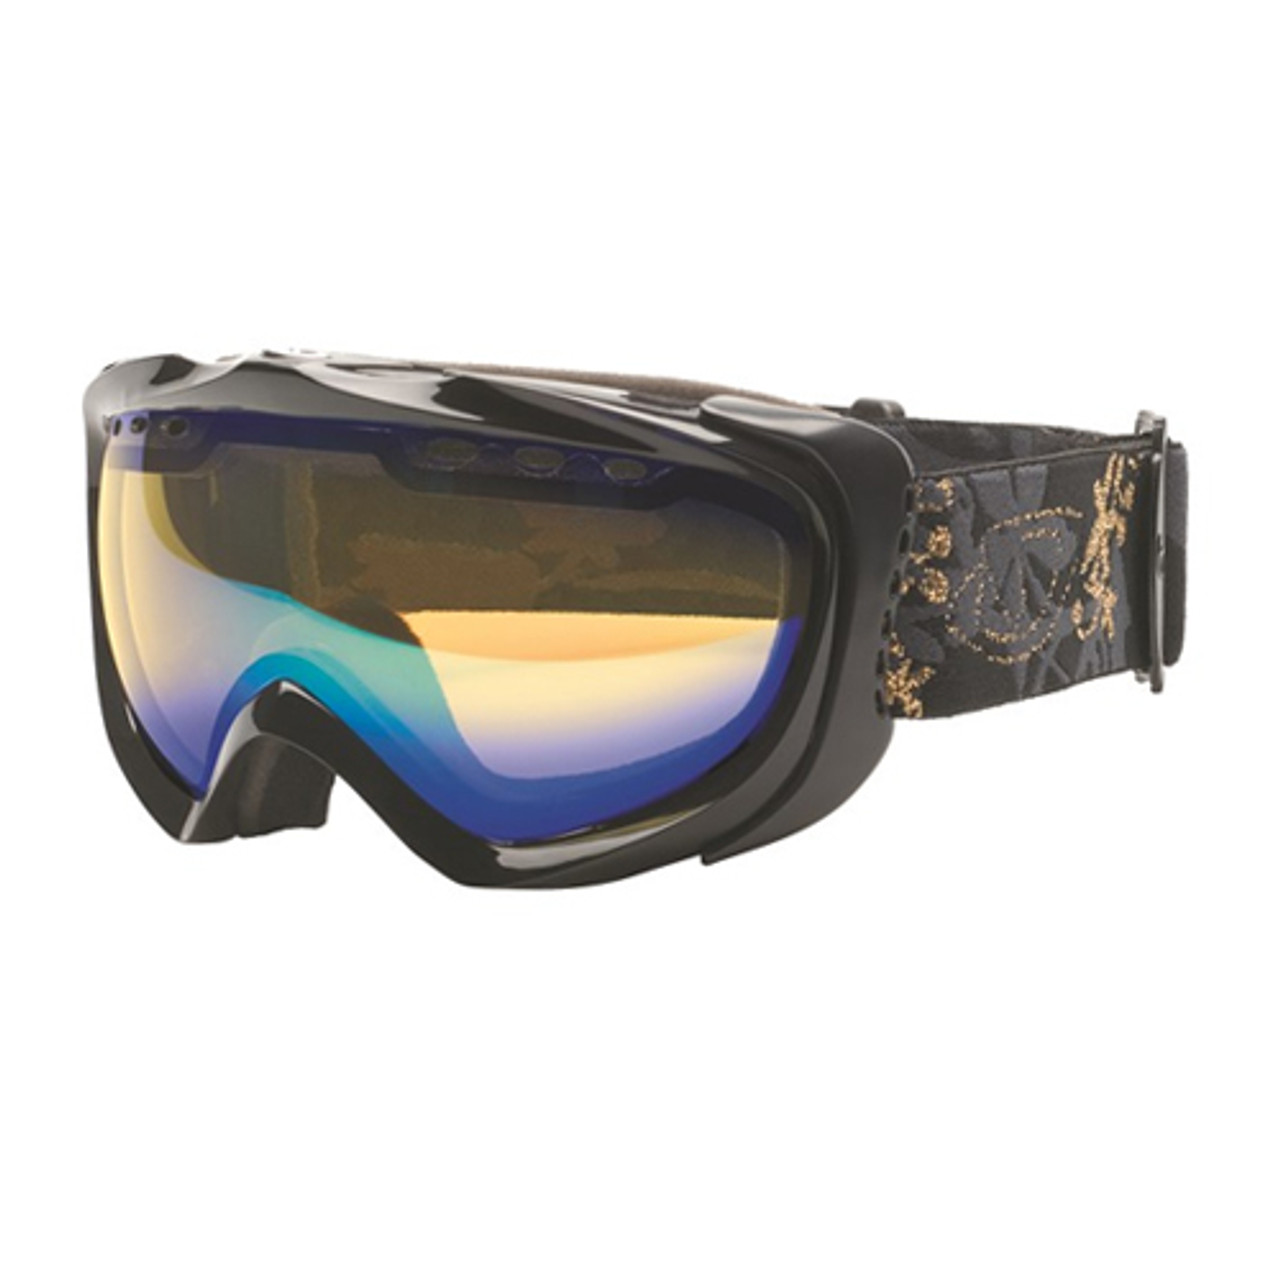 Lens for the Giro Lyric Hew Ski Goggles